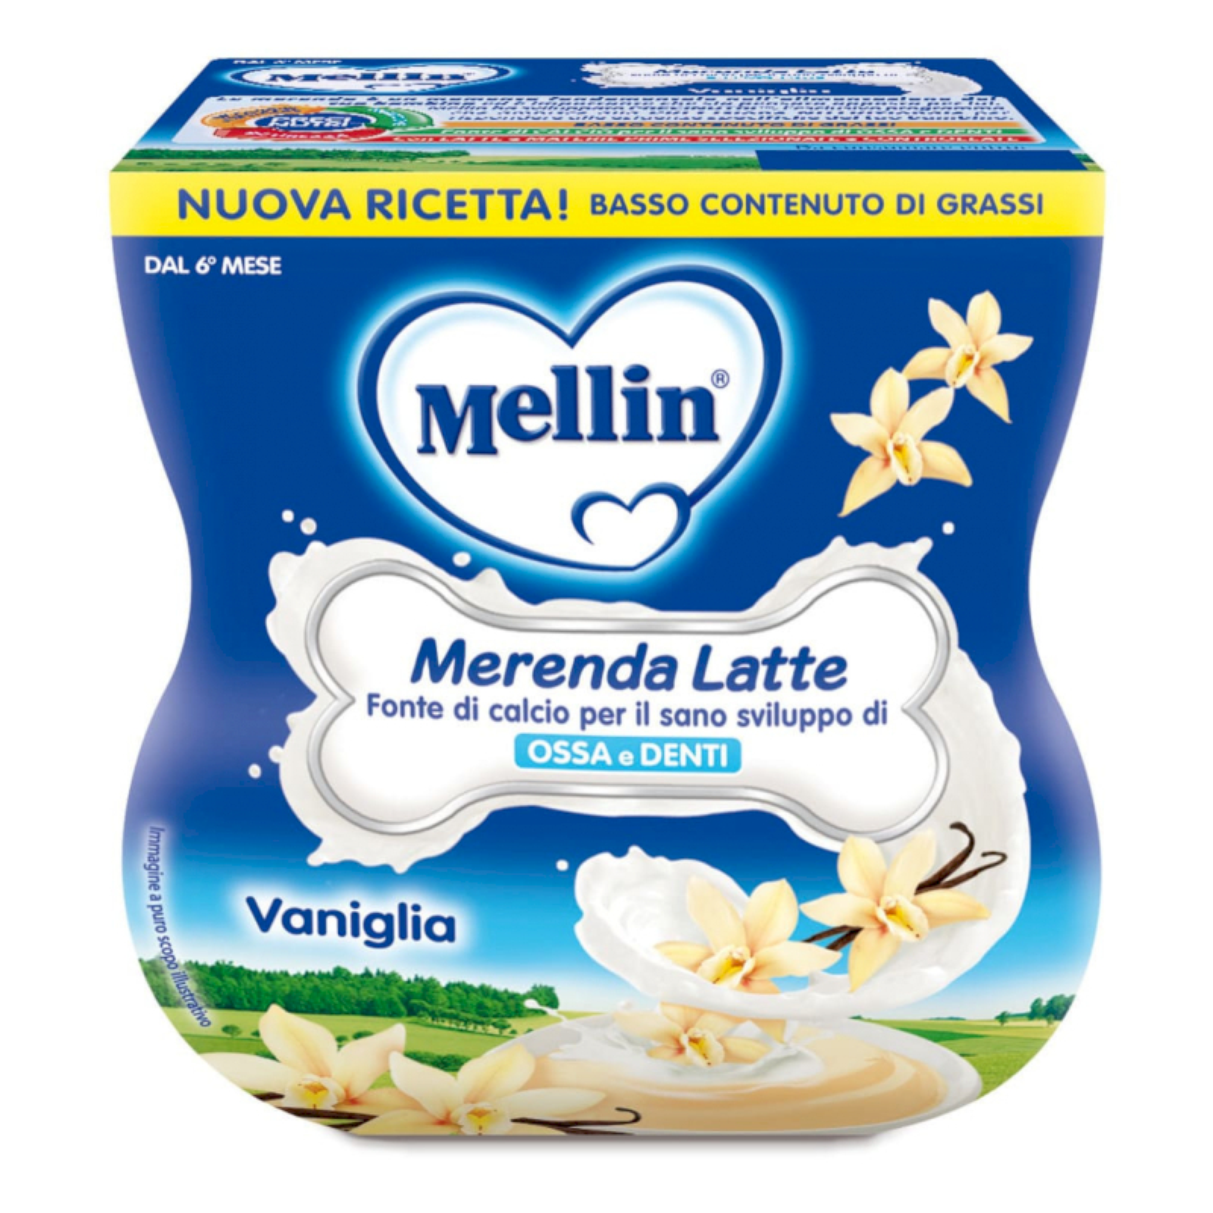 Merenda Latte e Vaniglia Mellin